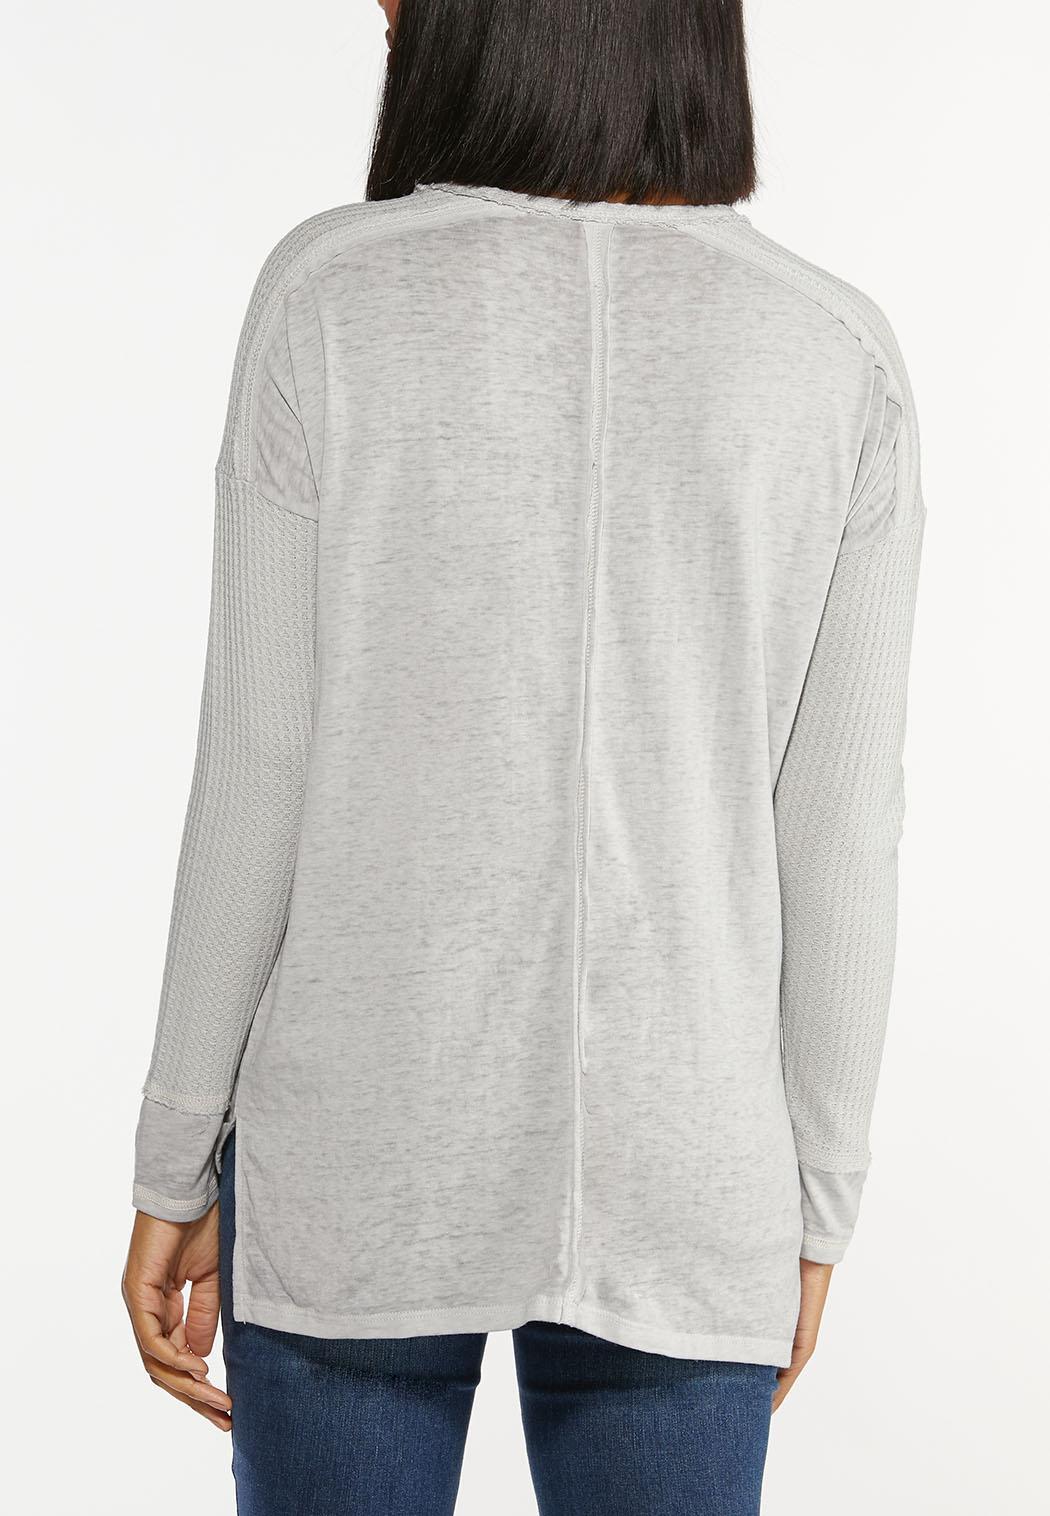 Fearless Waffle Sleeve Shirt (Item #44437486)